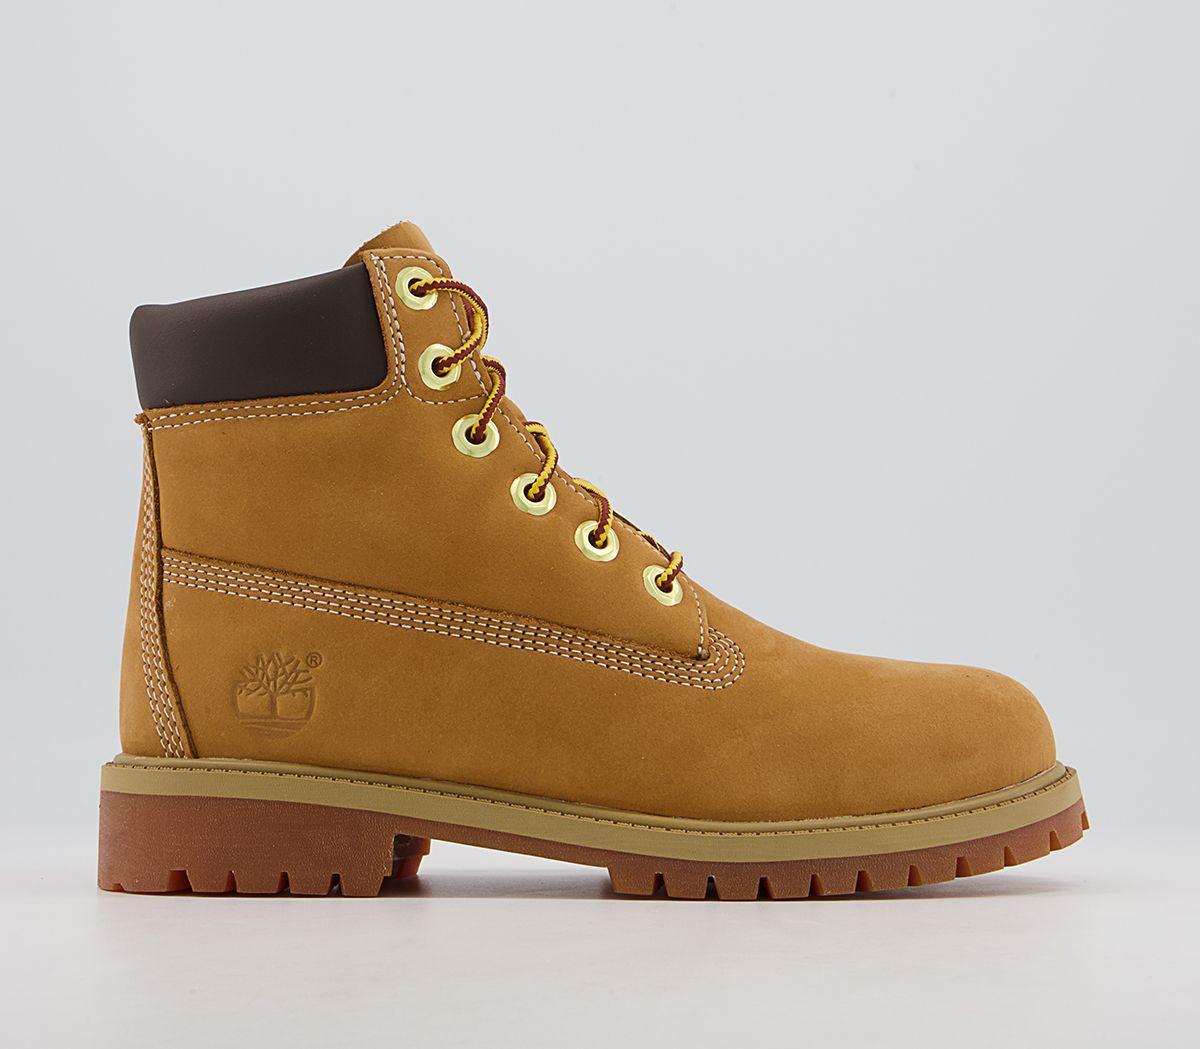 4e22f15231b Juniors 6 Inch Premium Waterproof Boots